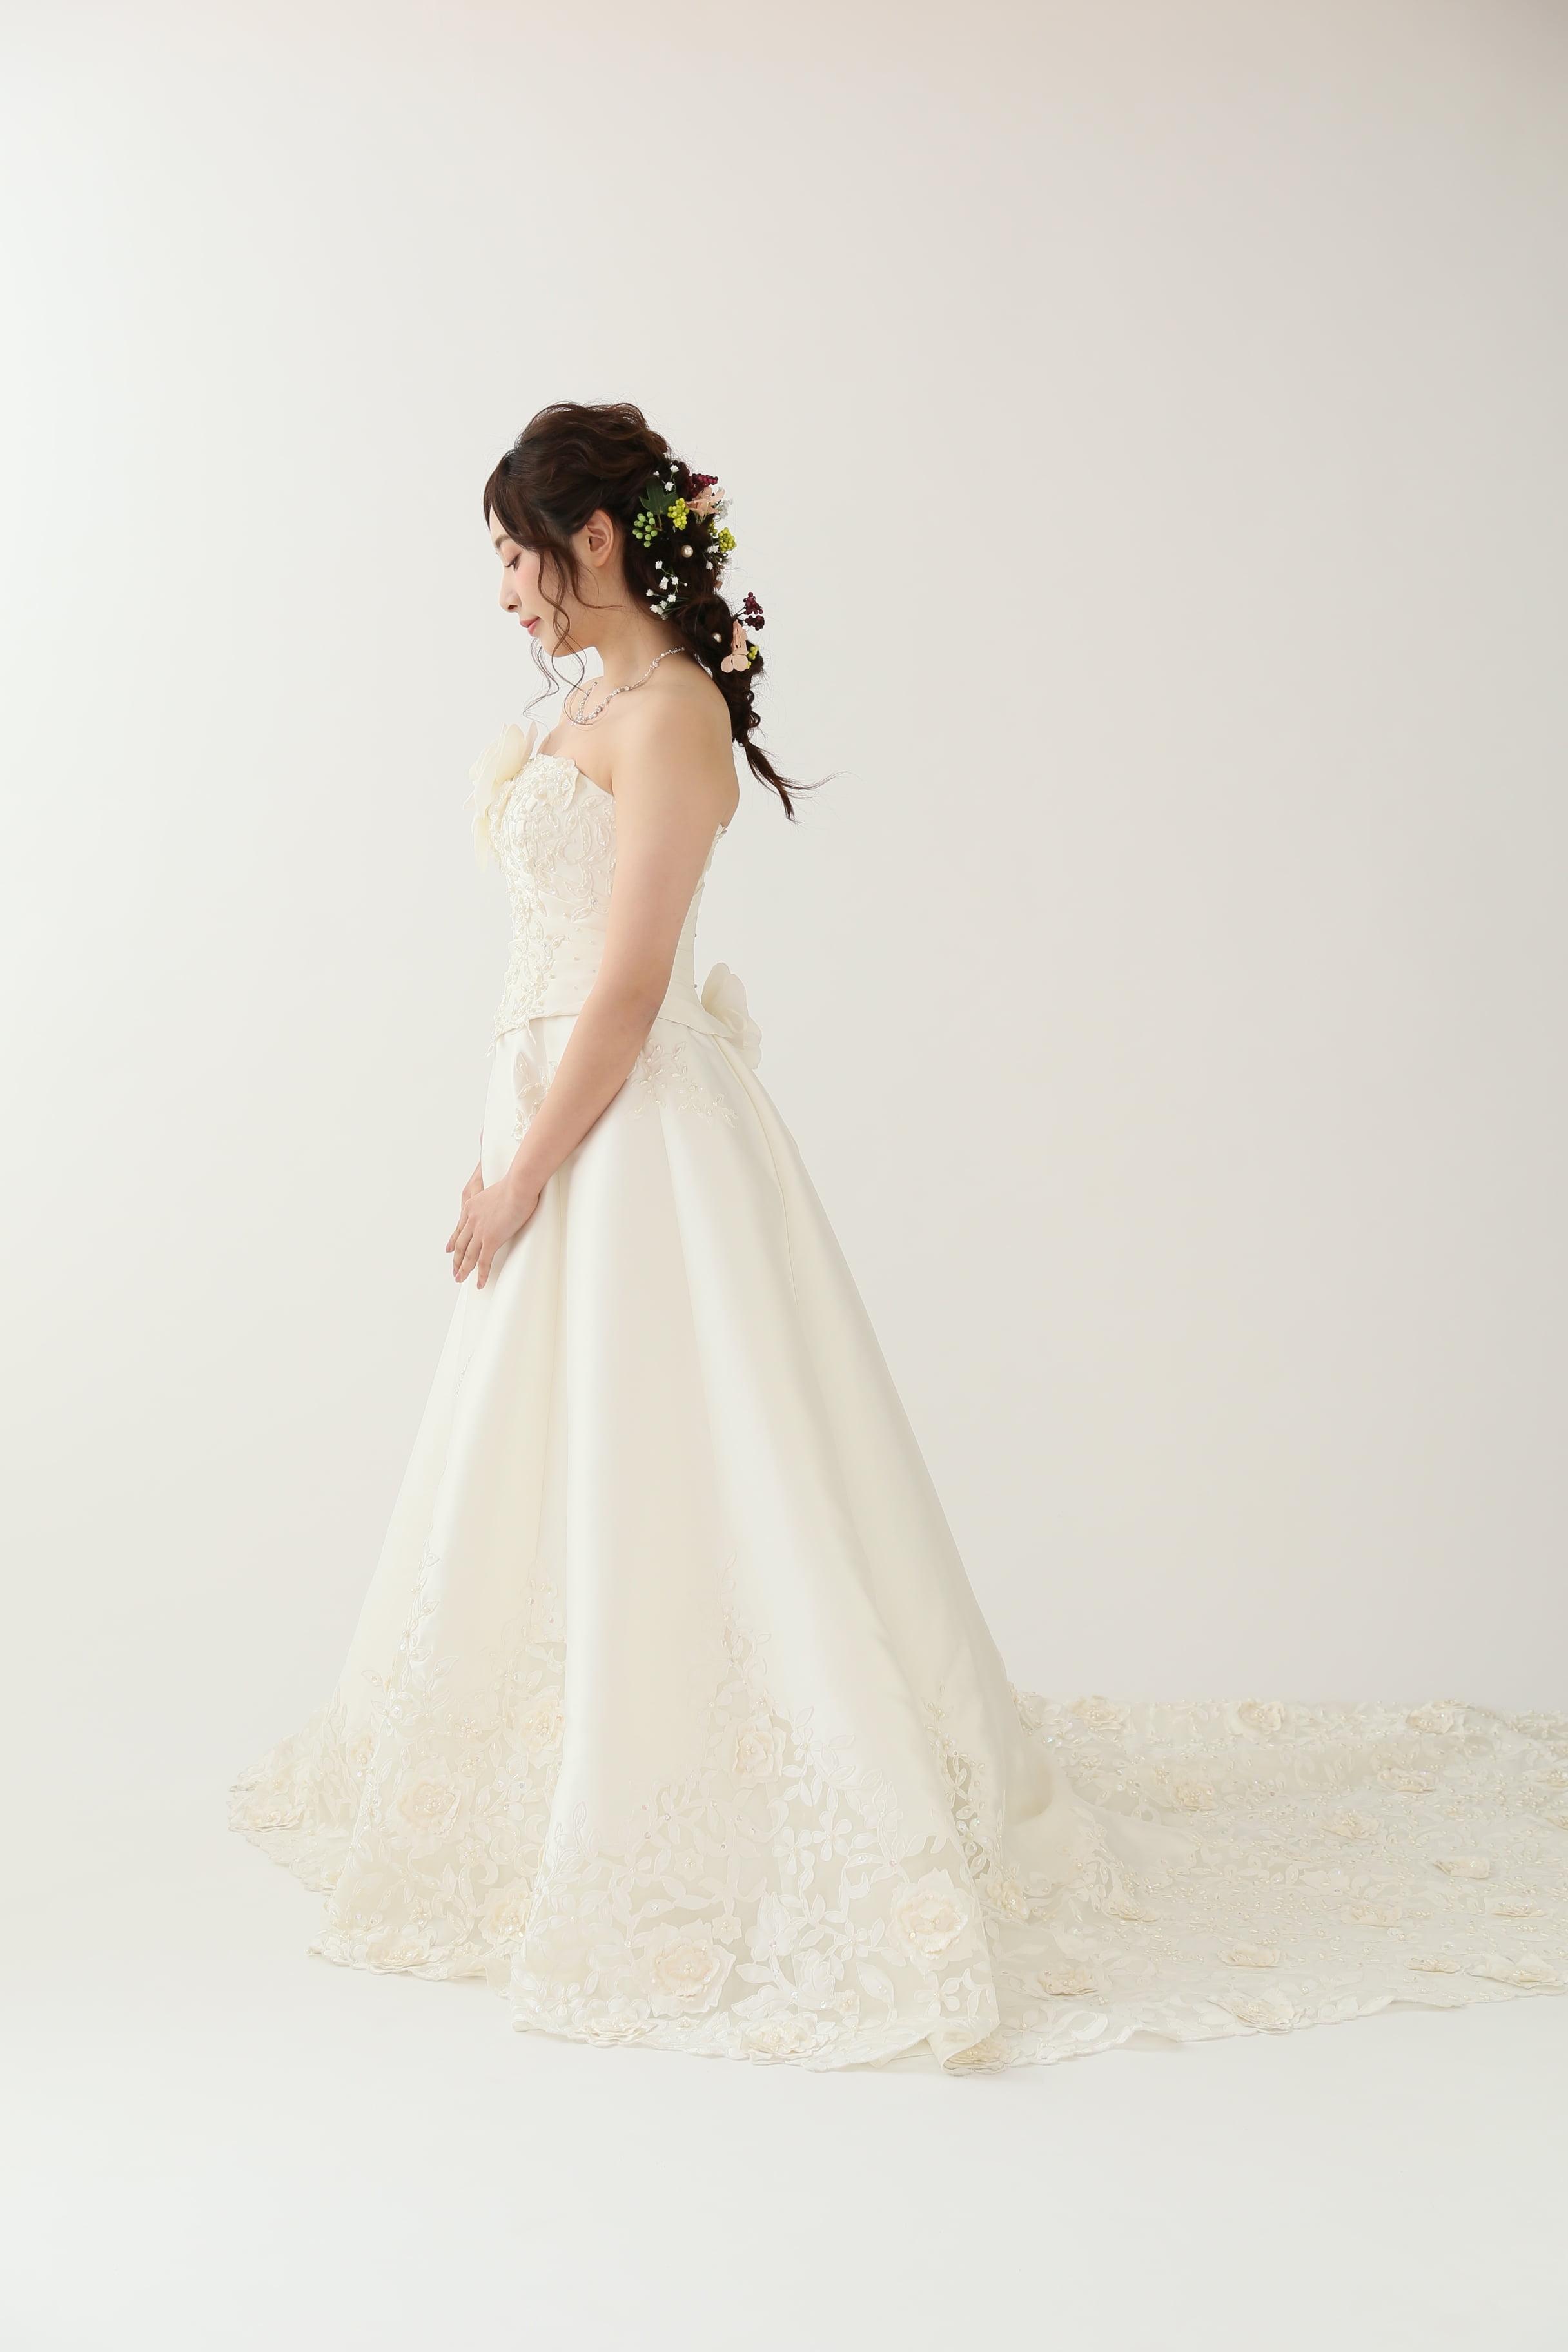 448bdb936312f 北海道花嫁必見♡ ウェディング・前撮りにおすすめヘアスタイルのご紹介 ...